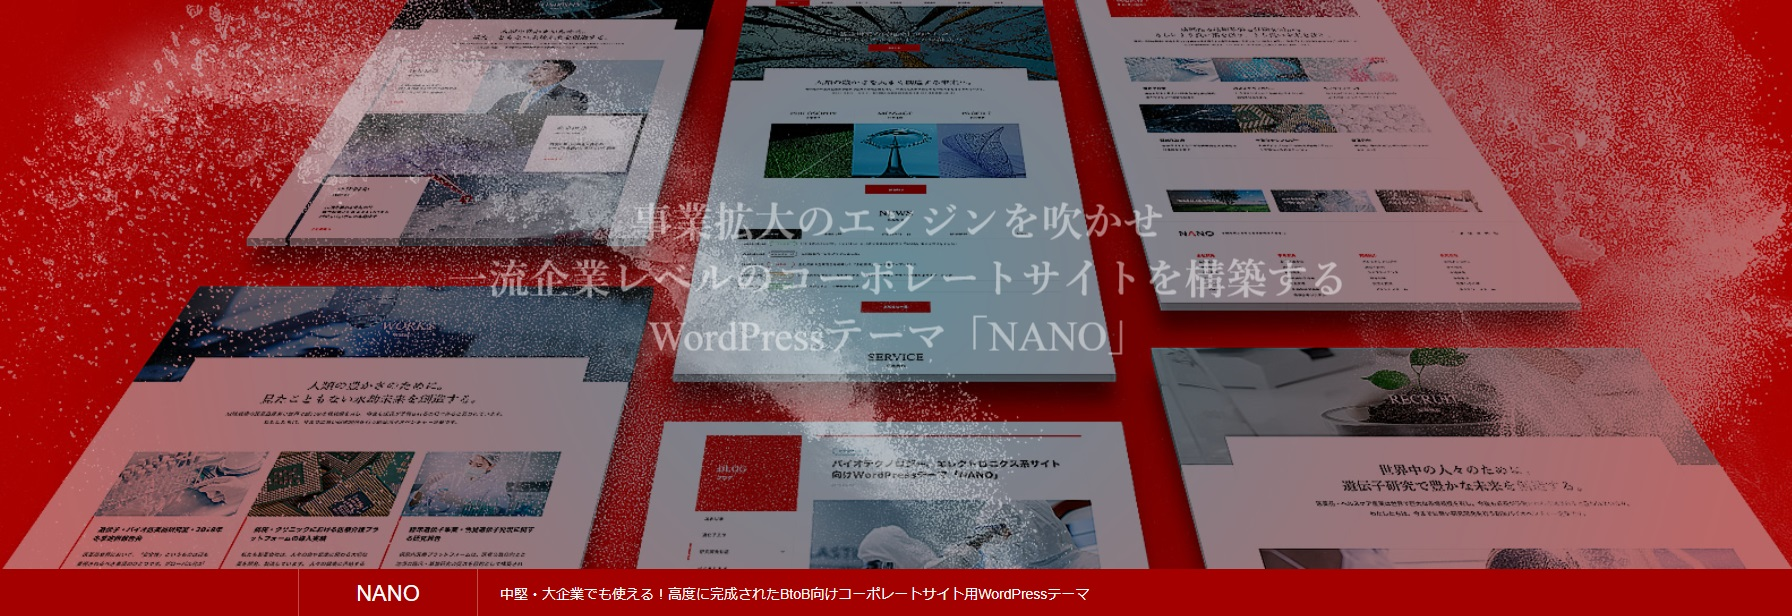 wordpress-theme-nano-tcd065